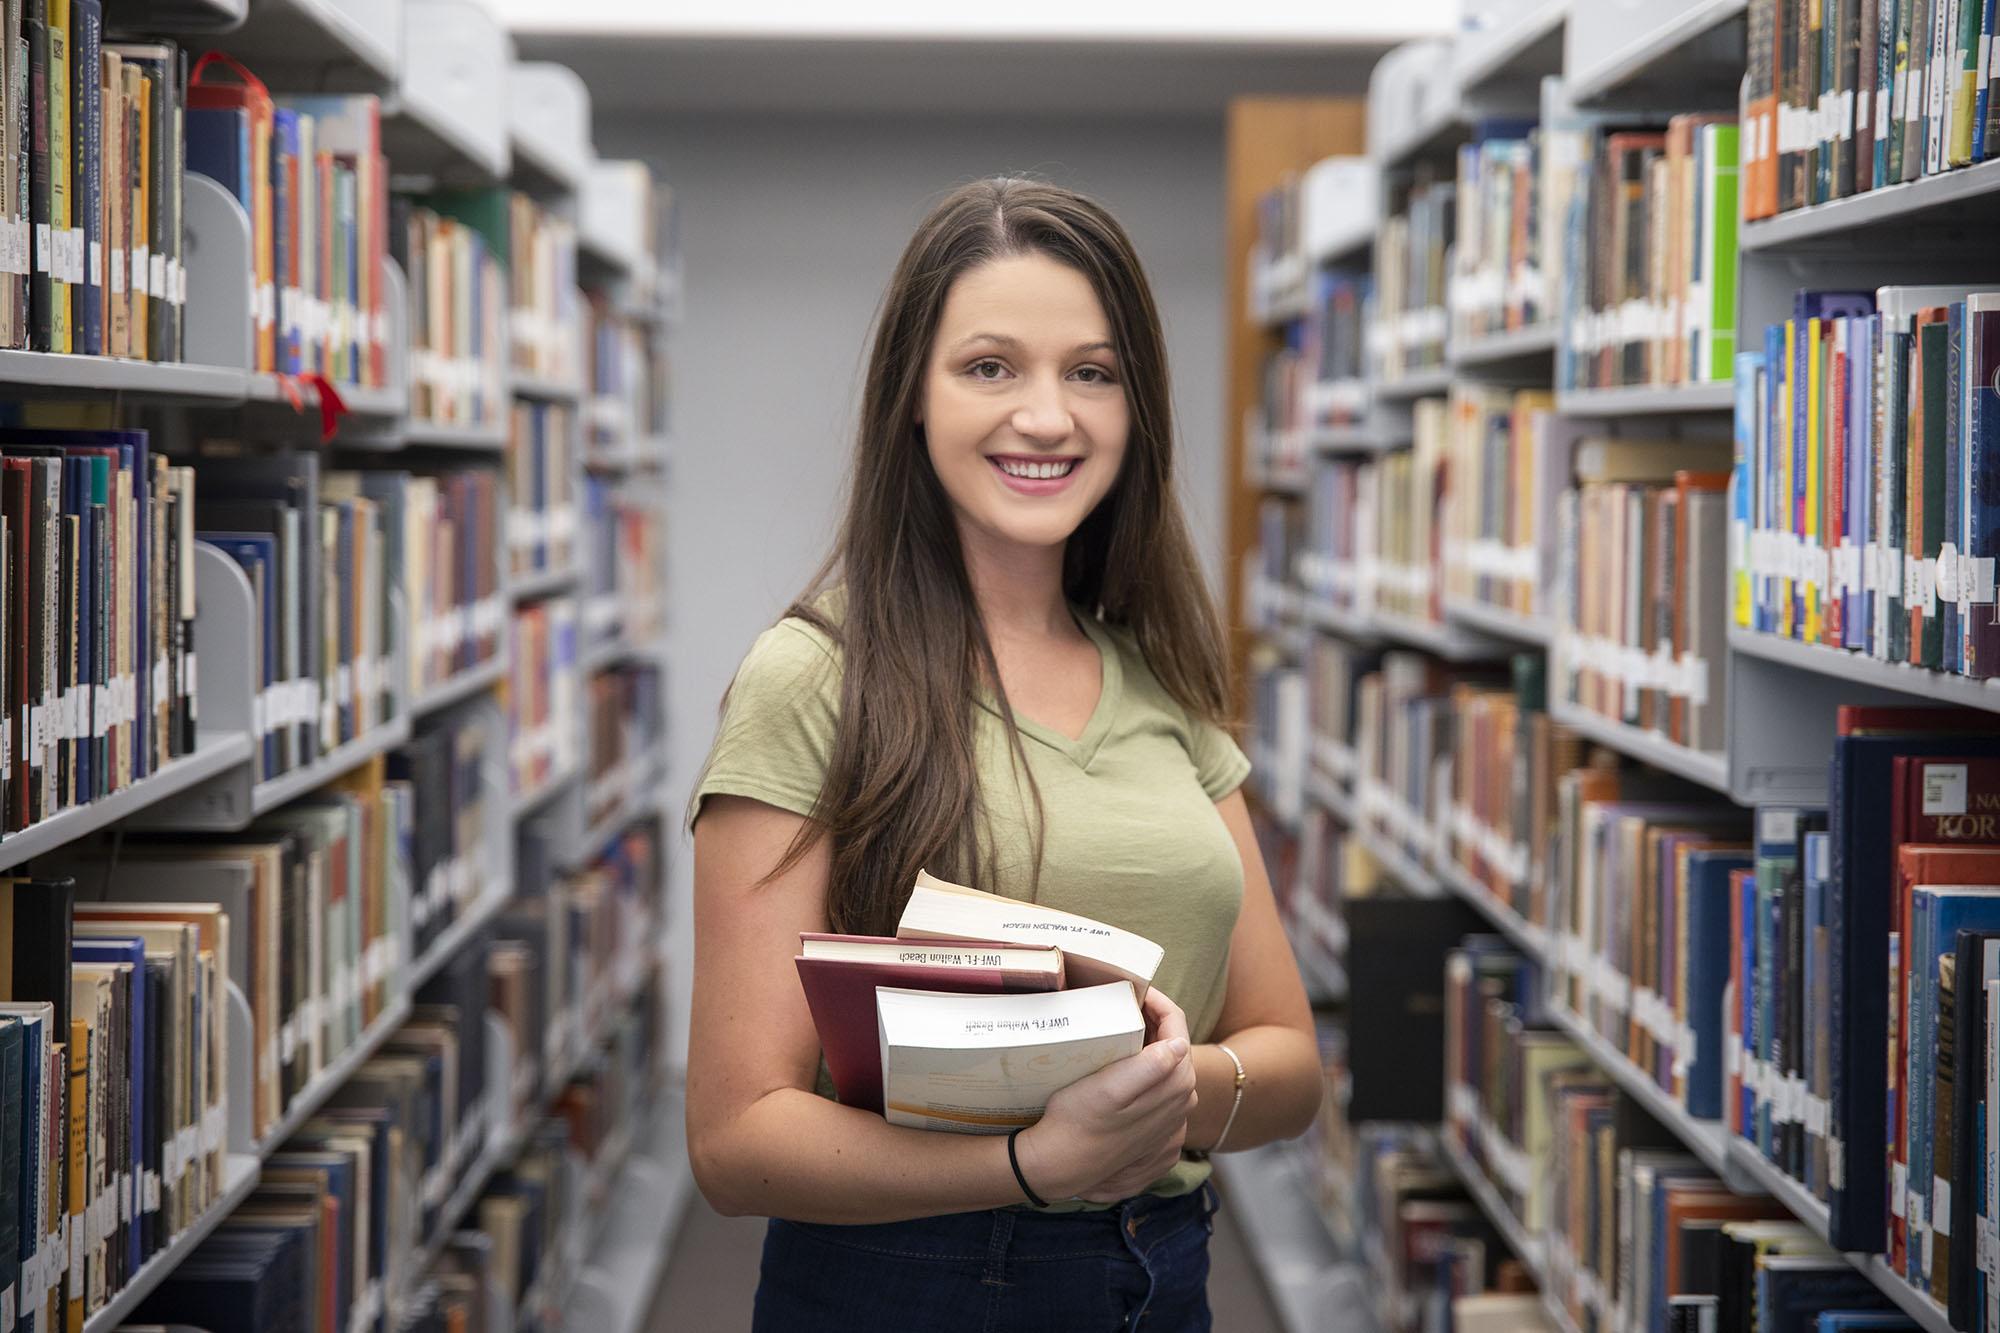 UWF student holding books in the UWF Emerald Coast Library